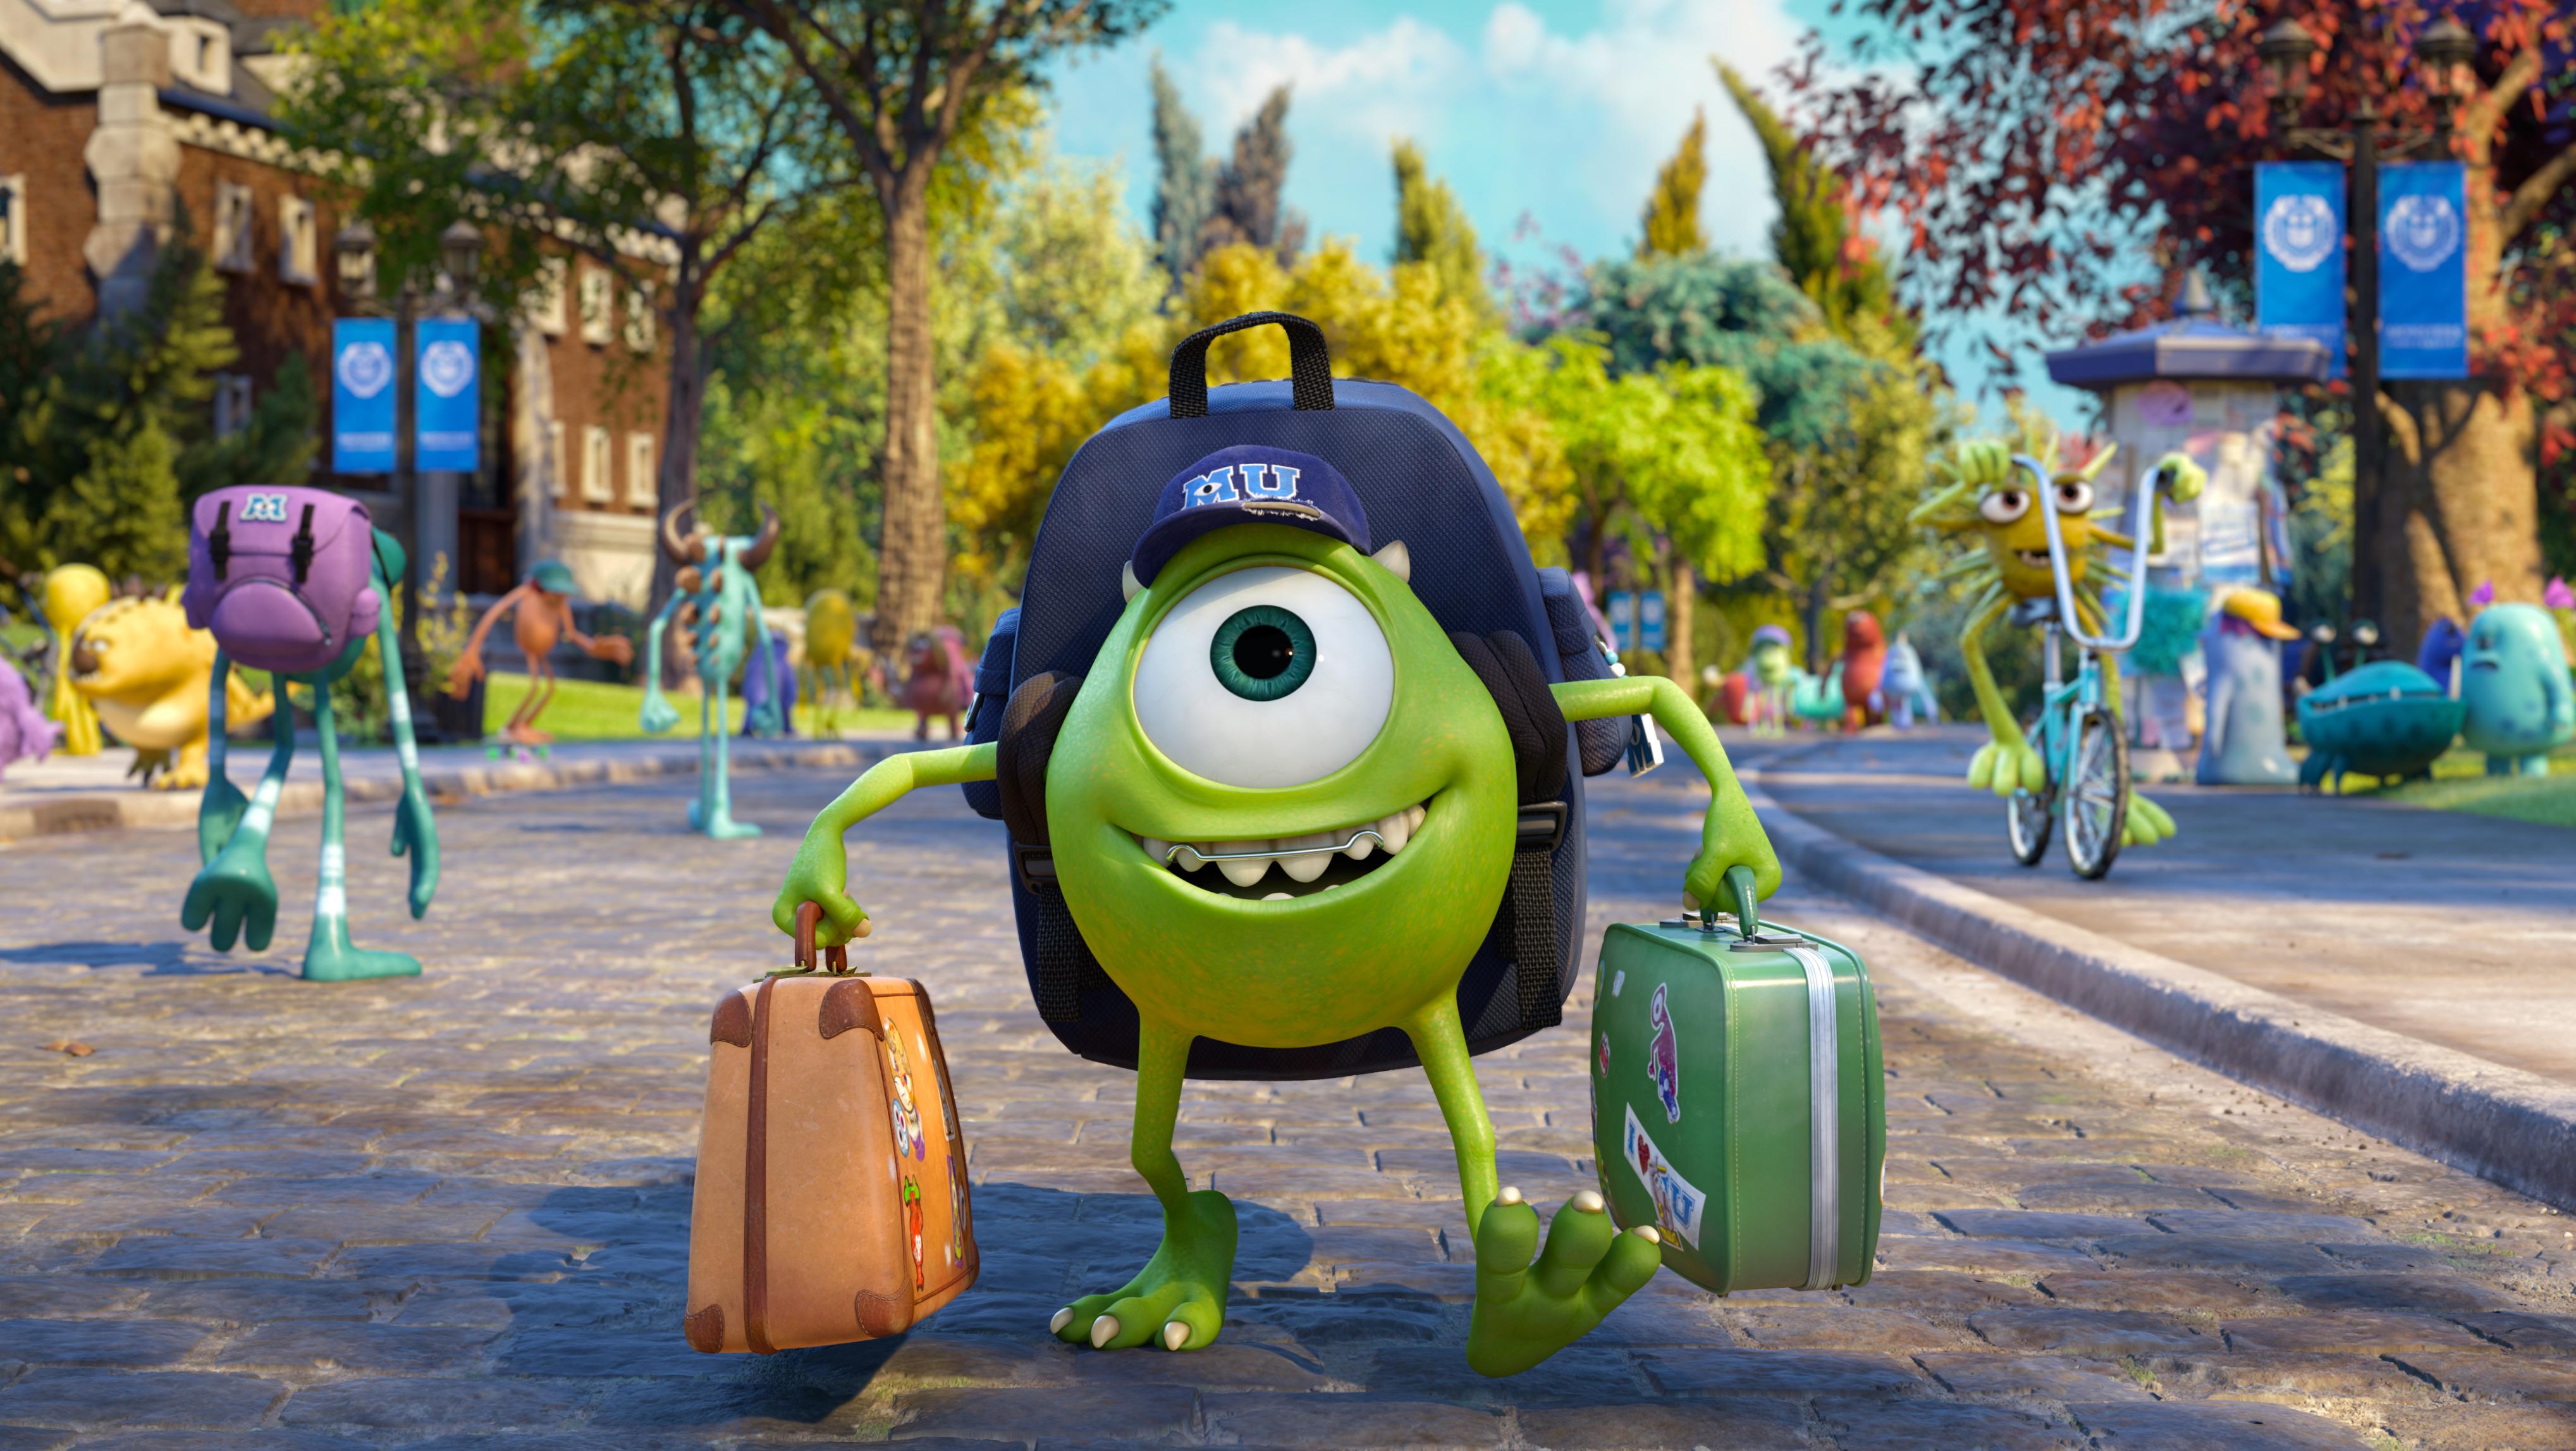 Pixar #8